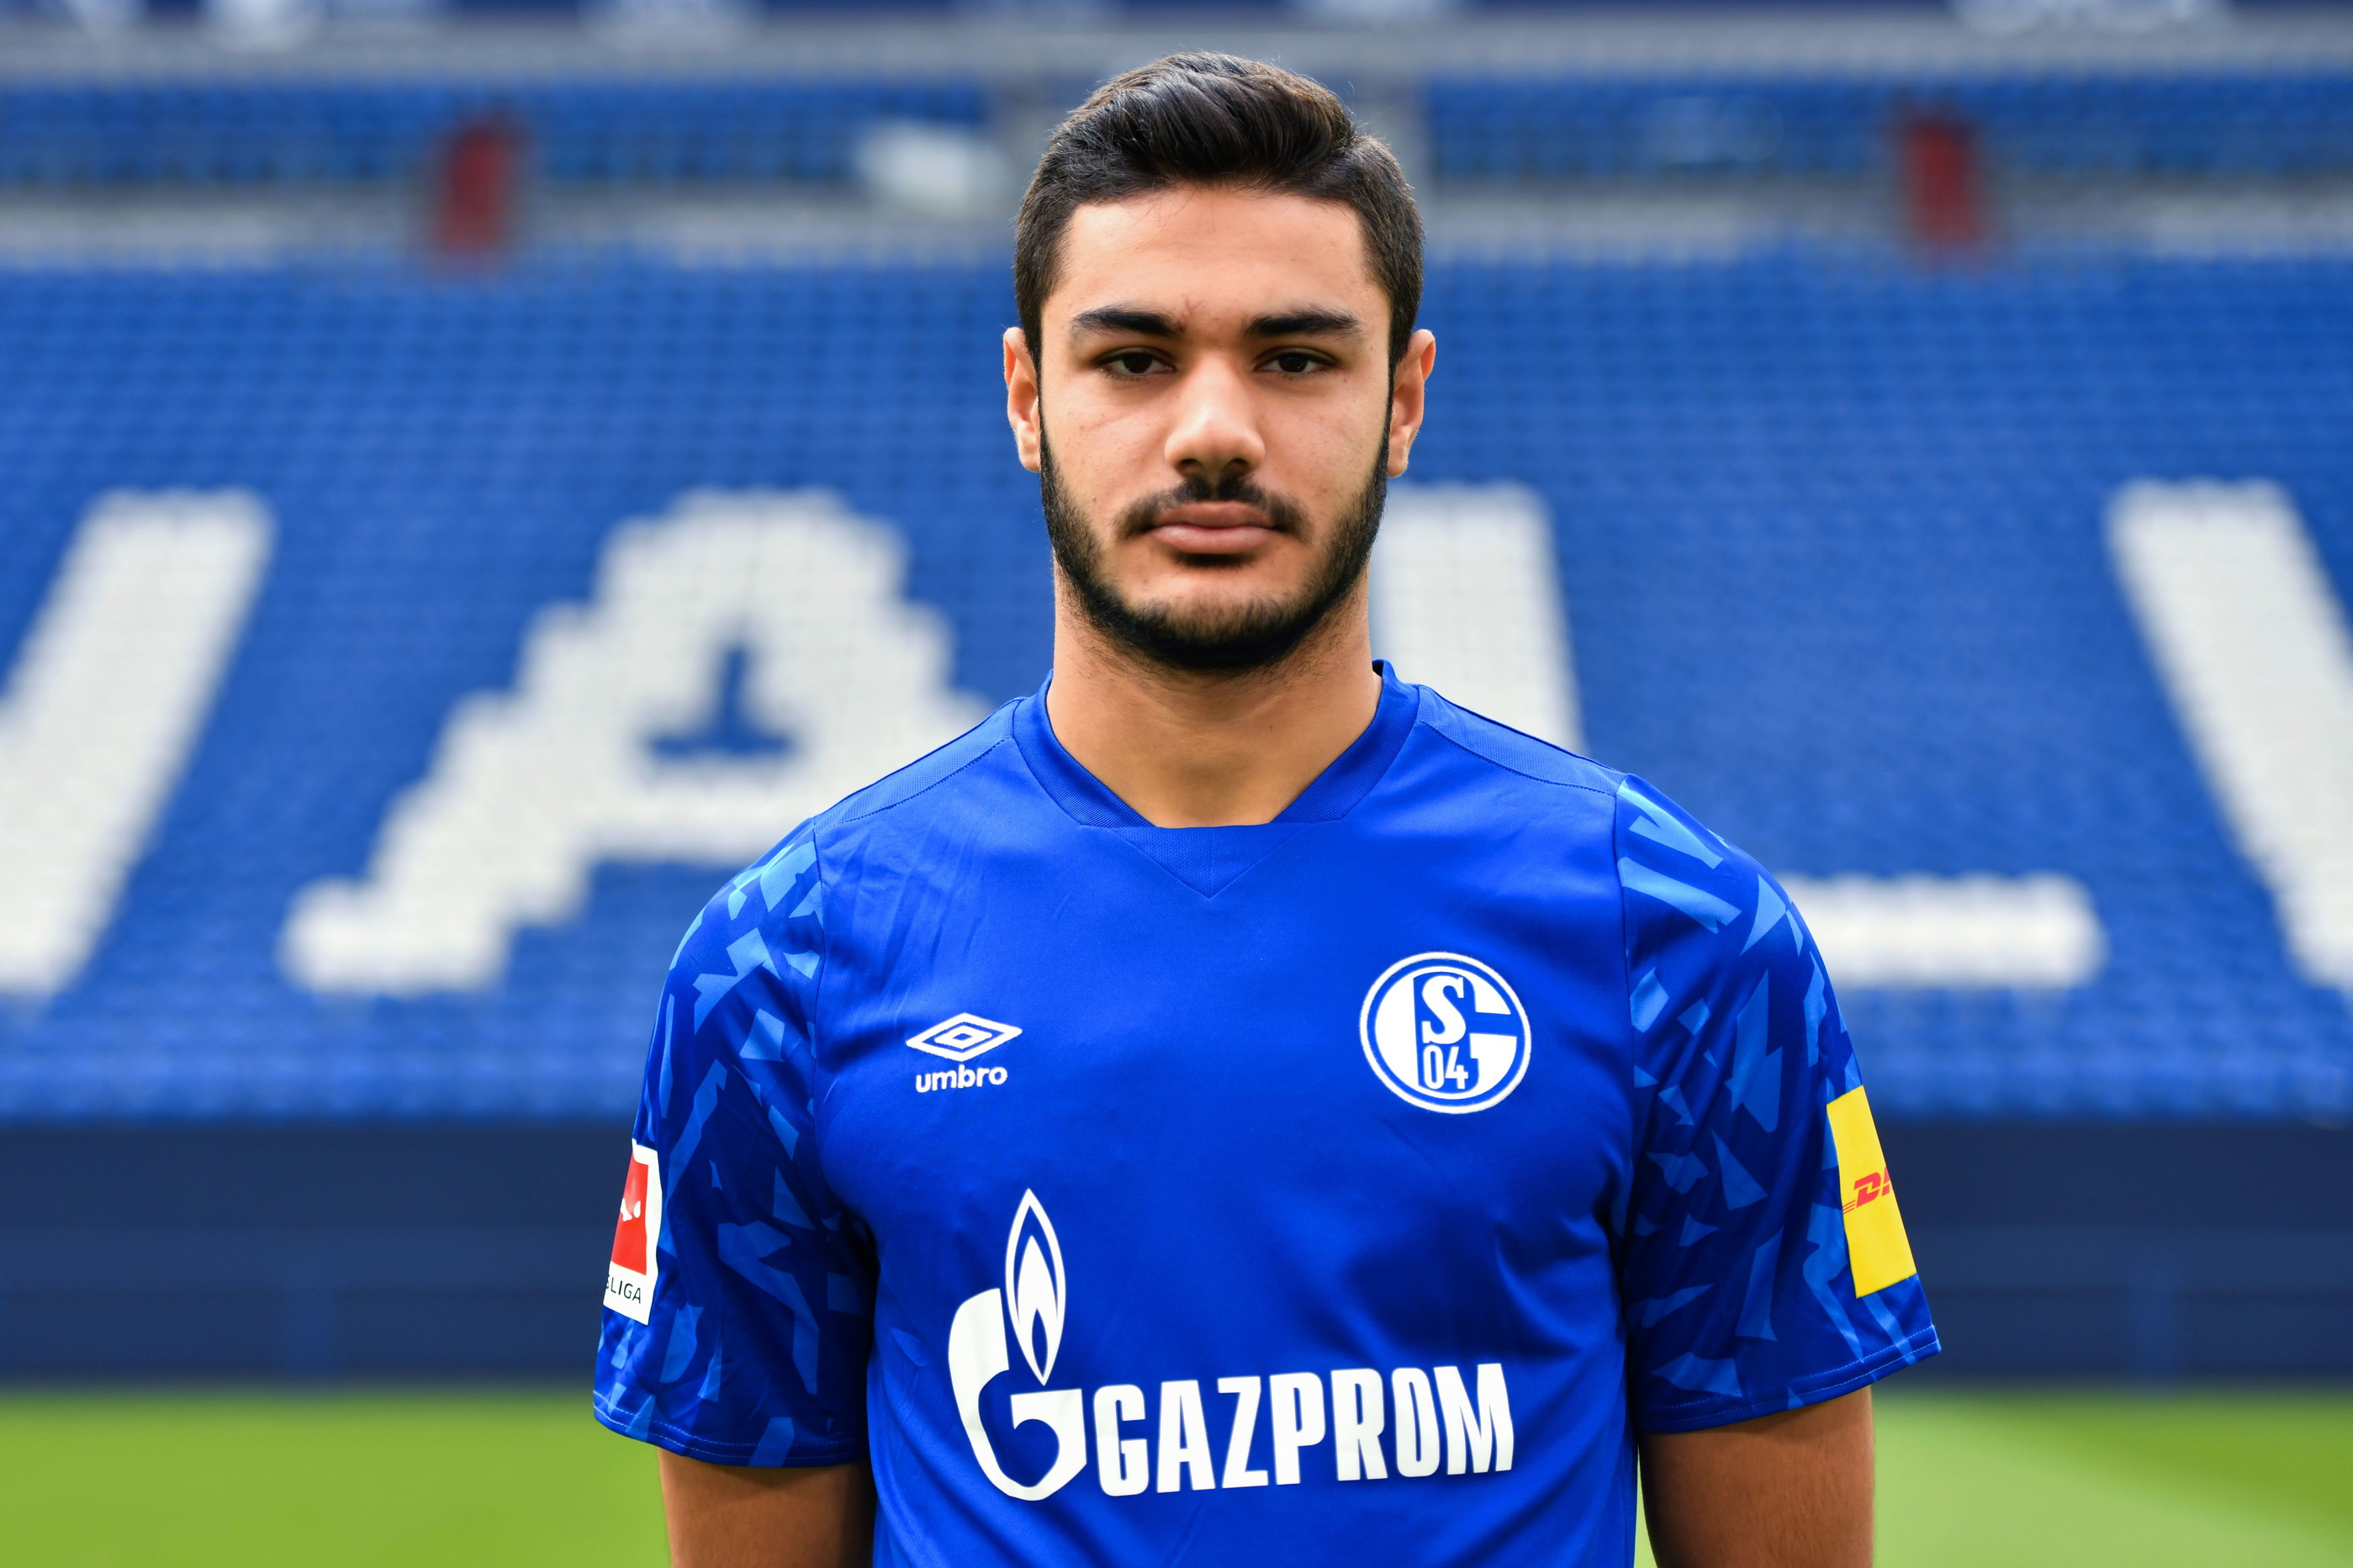 Ozan Kabak (Schalke 04): 42,6 milioni